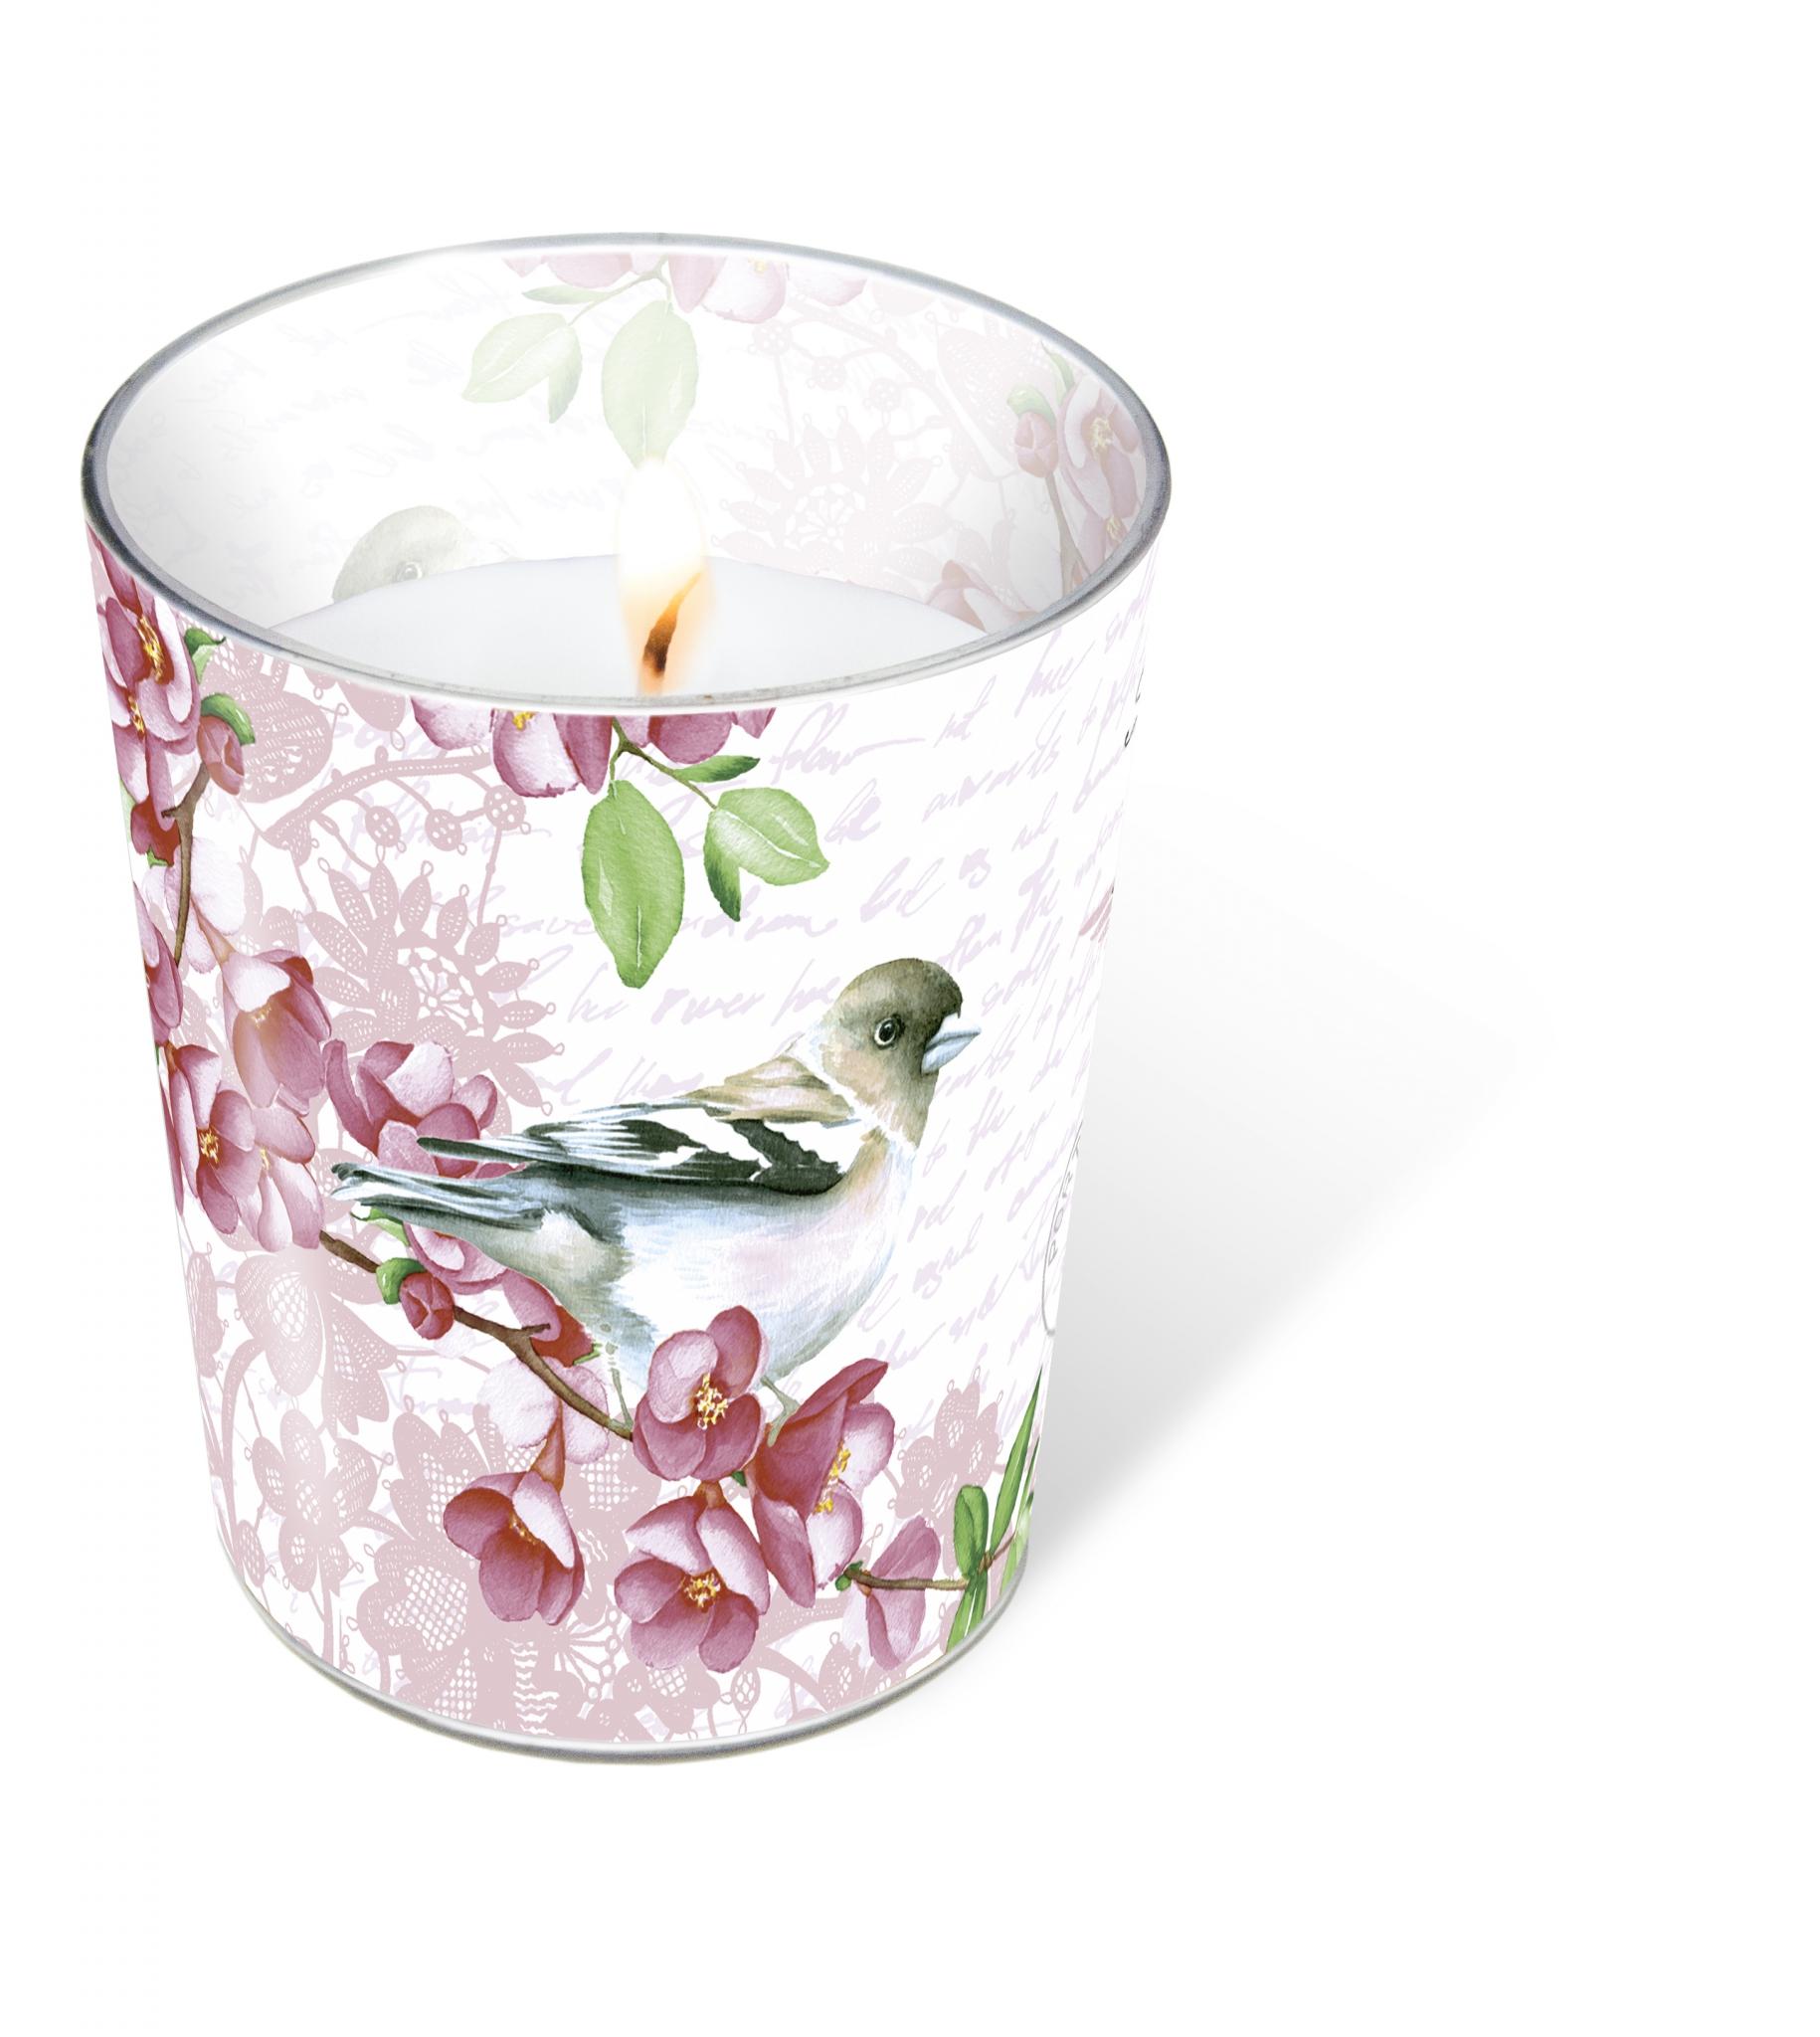 glass candle - Sweet bird